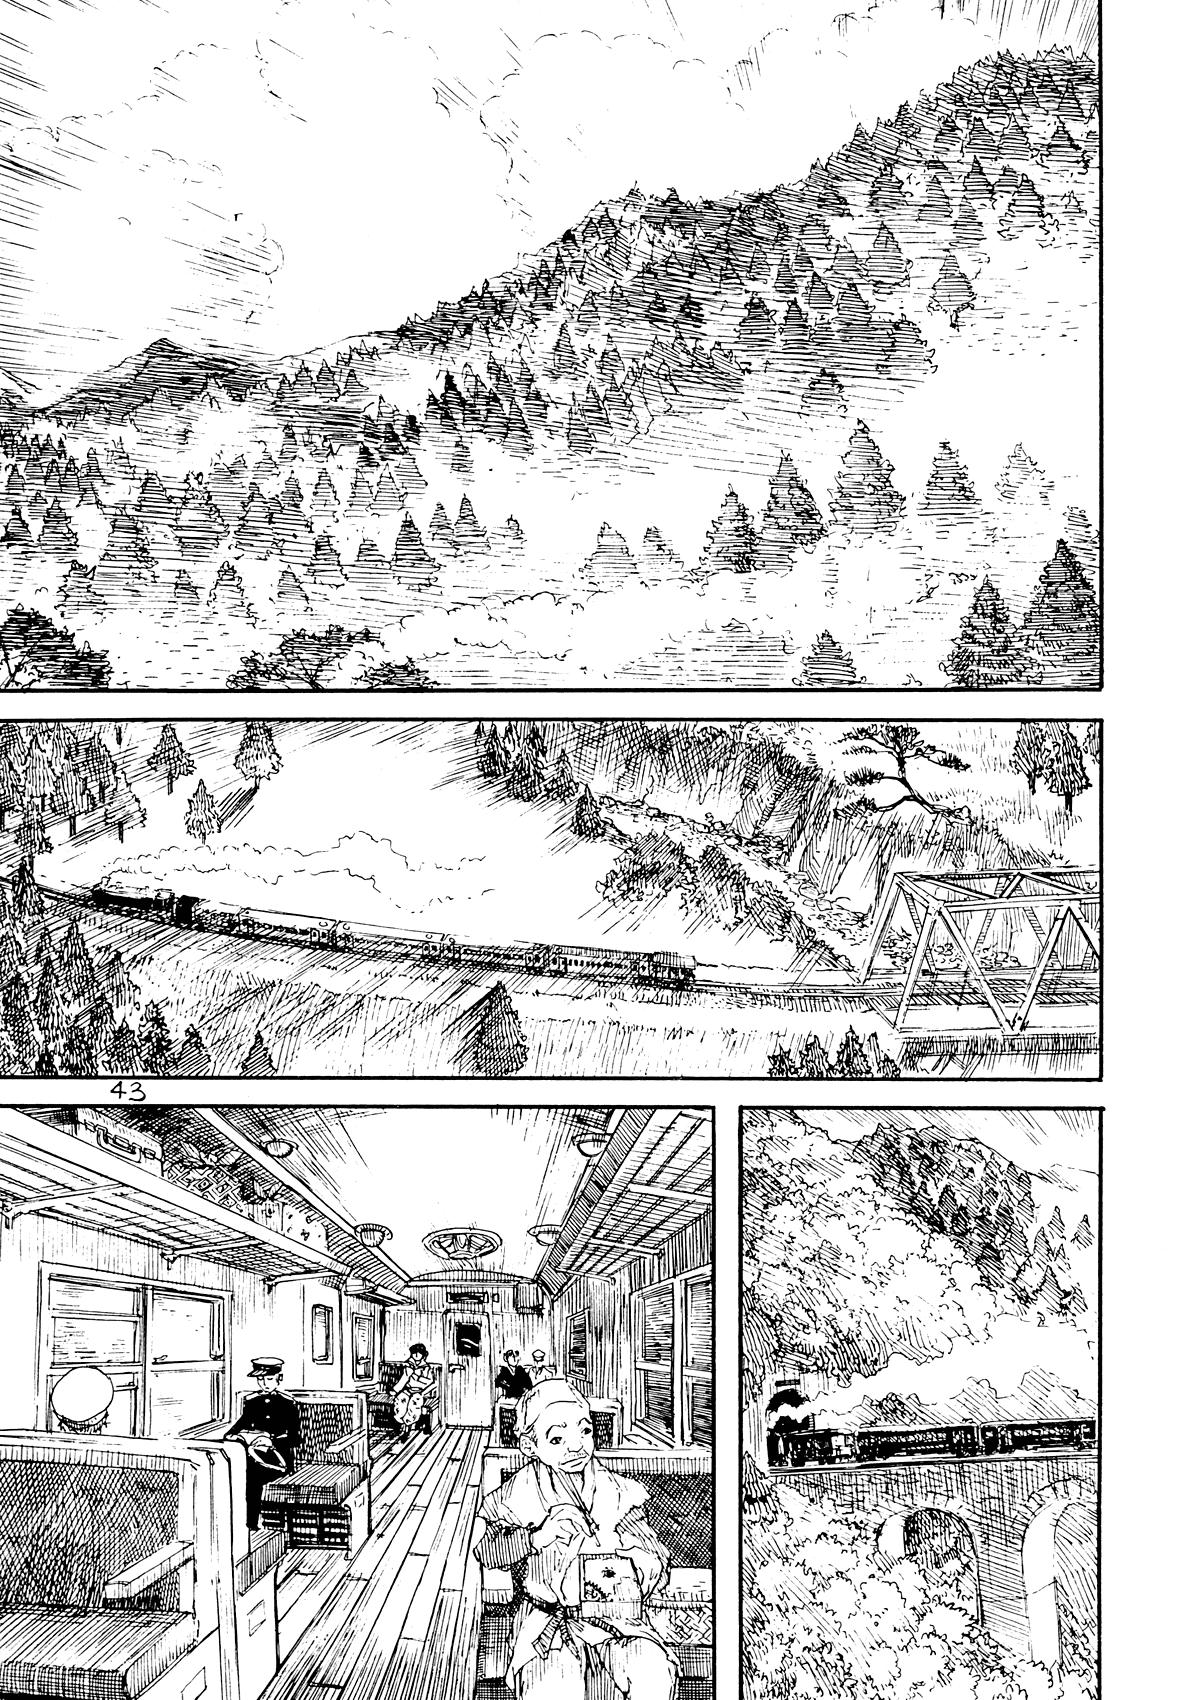 http://lector.patyscans.com/content/comics/ameyama-denshin_59ff0a9b2a4b8/1-0-rainmaker-1_59ff0aedc8aef/000.jpg